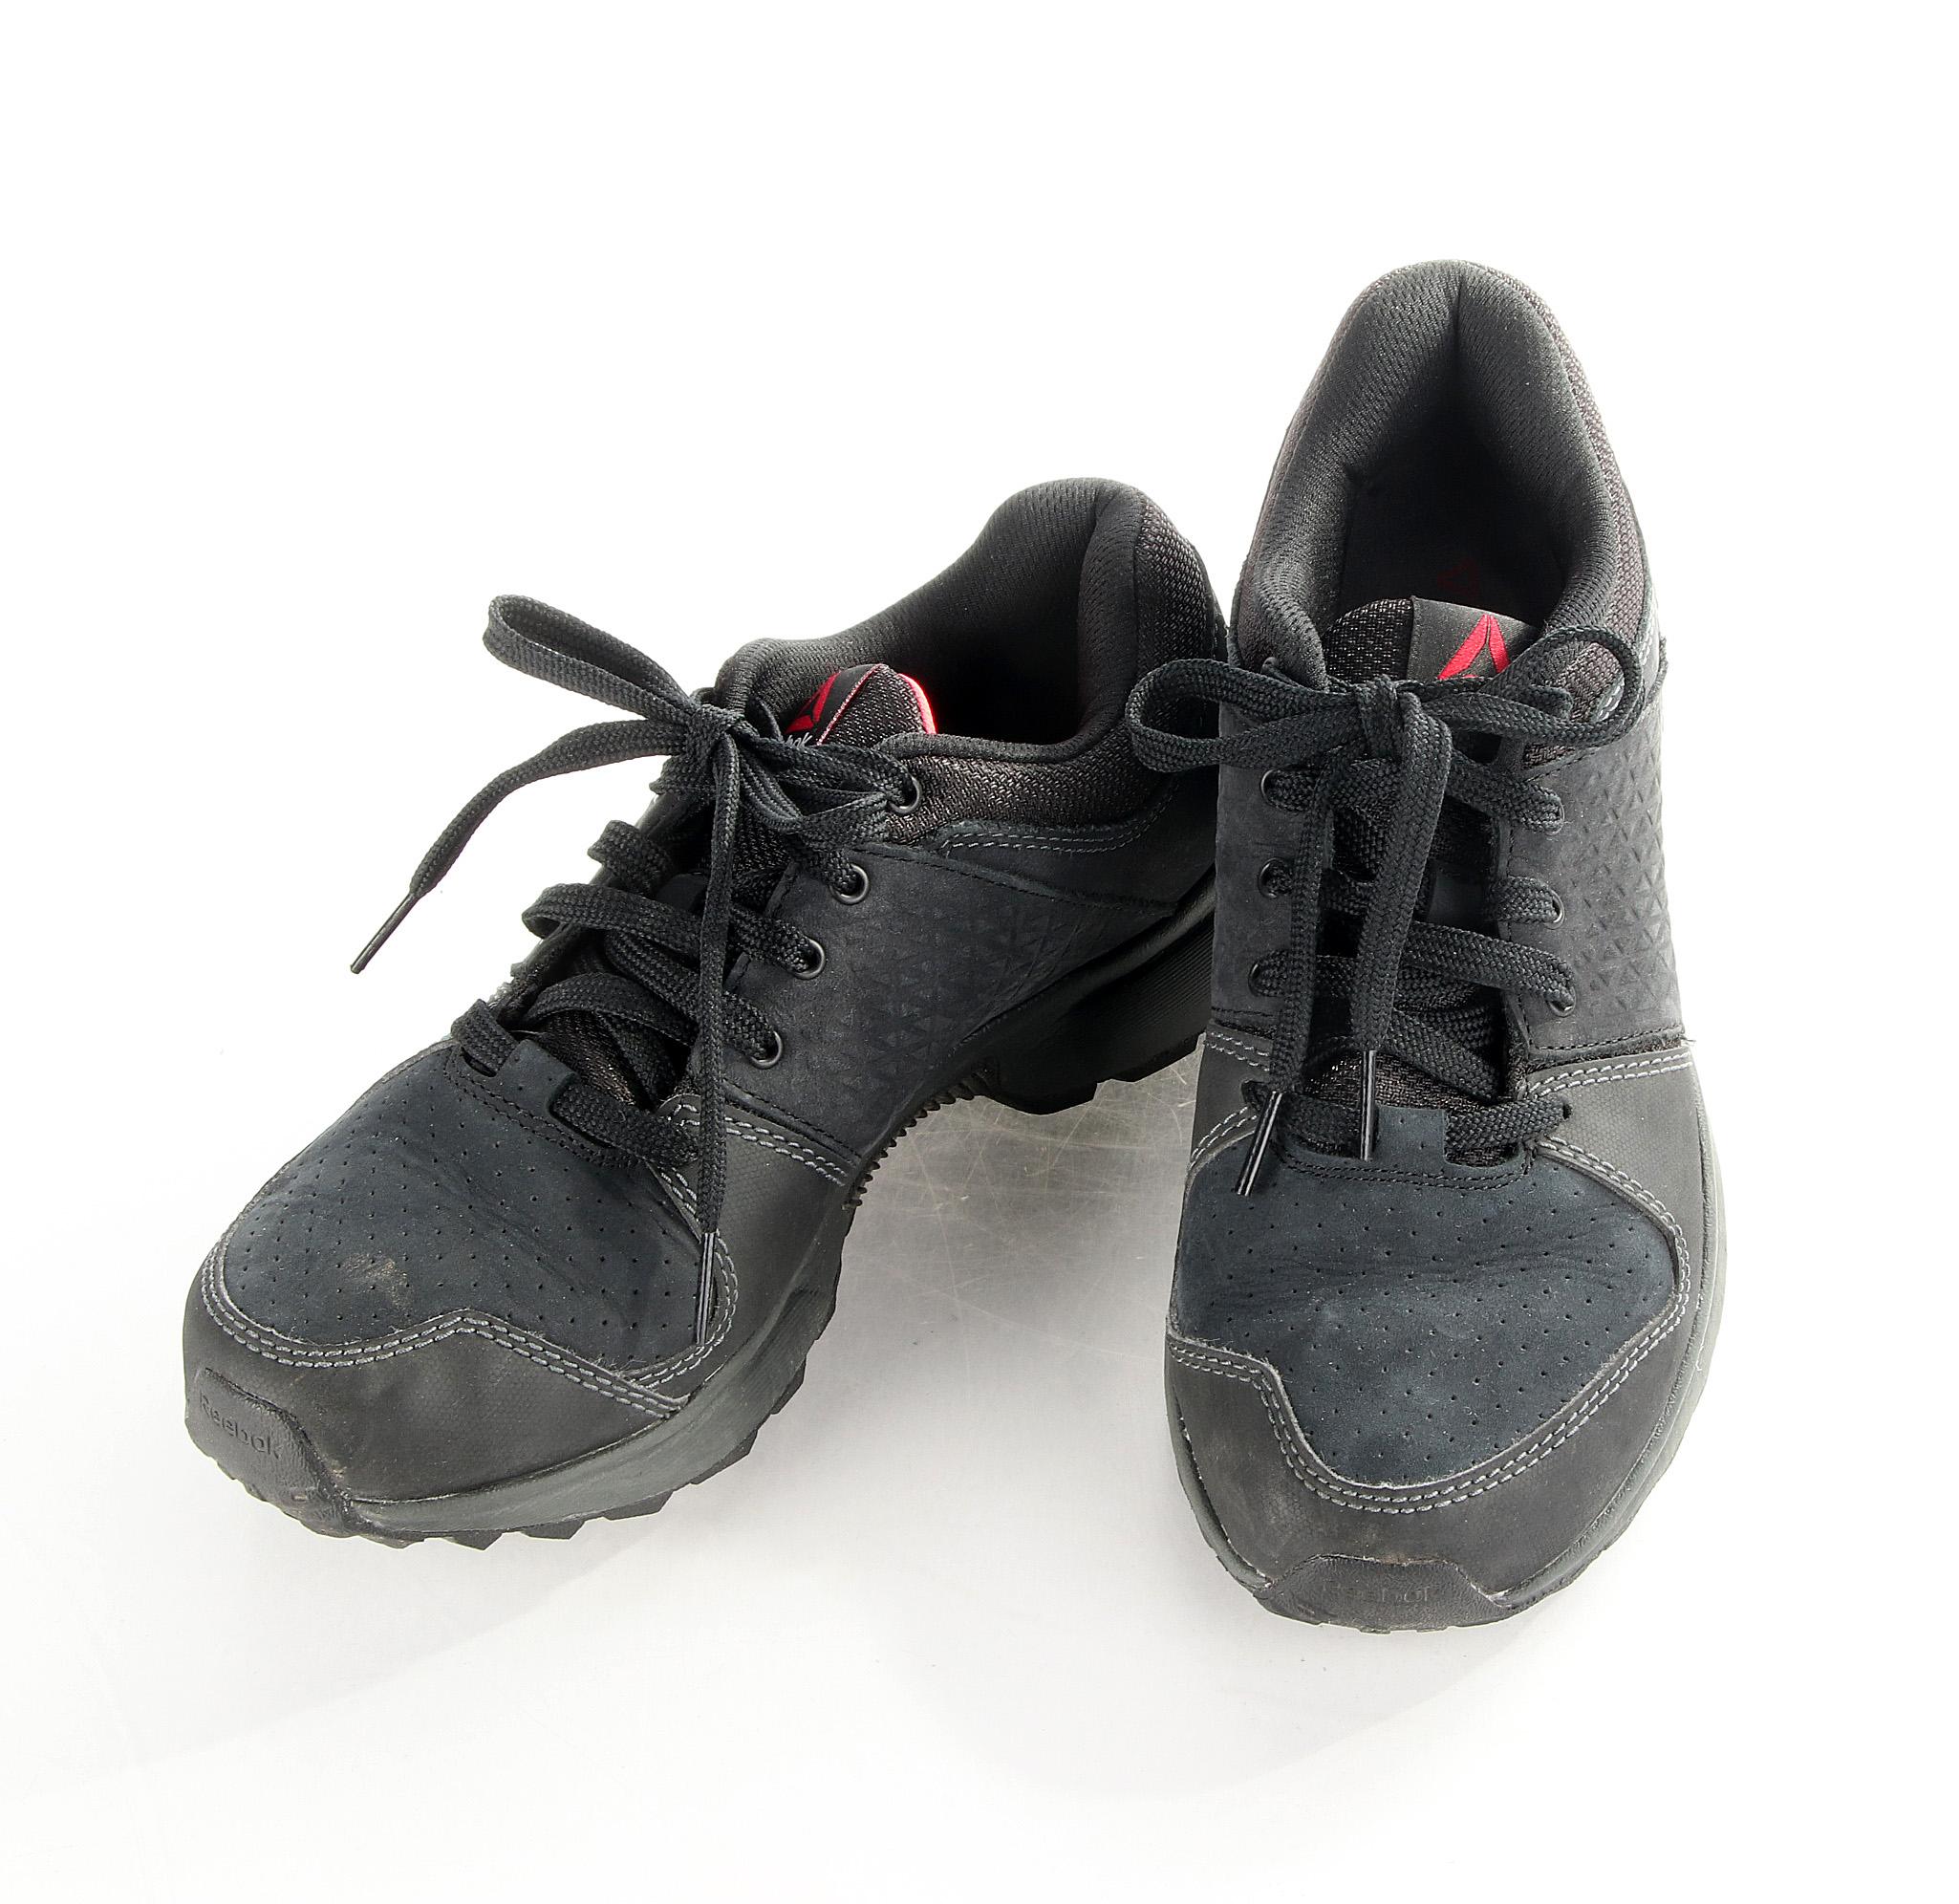 Reebok Sporterra VI Walkingschuhe Damen schwarz im Online